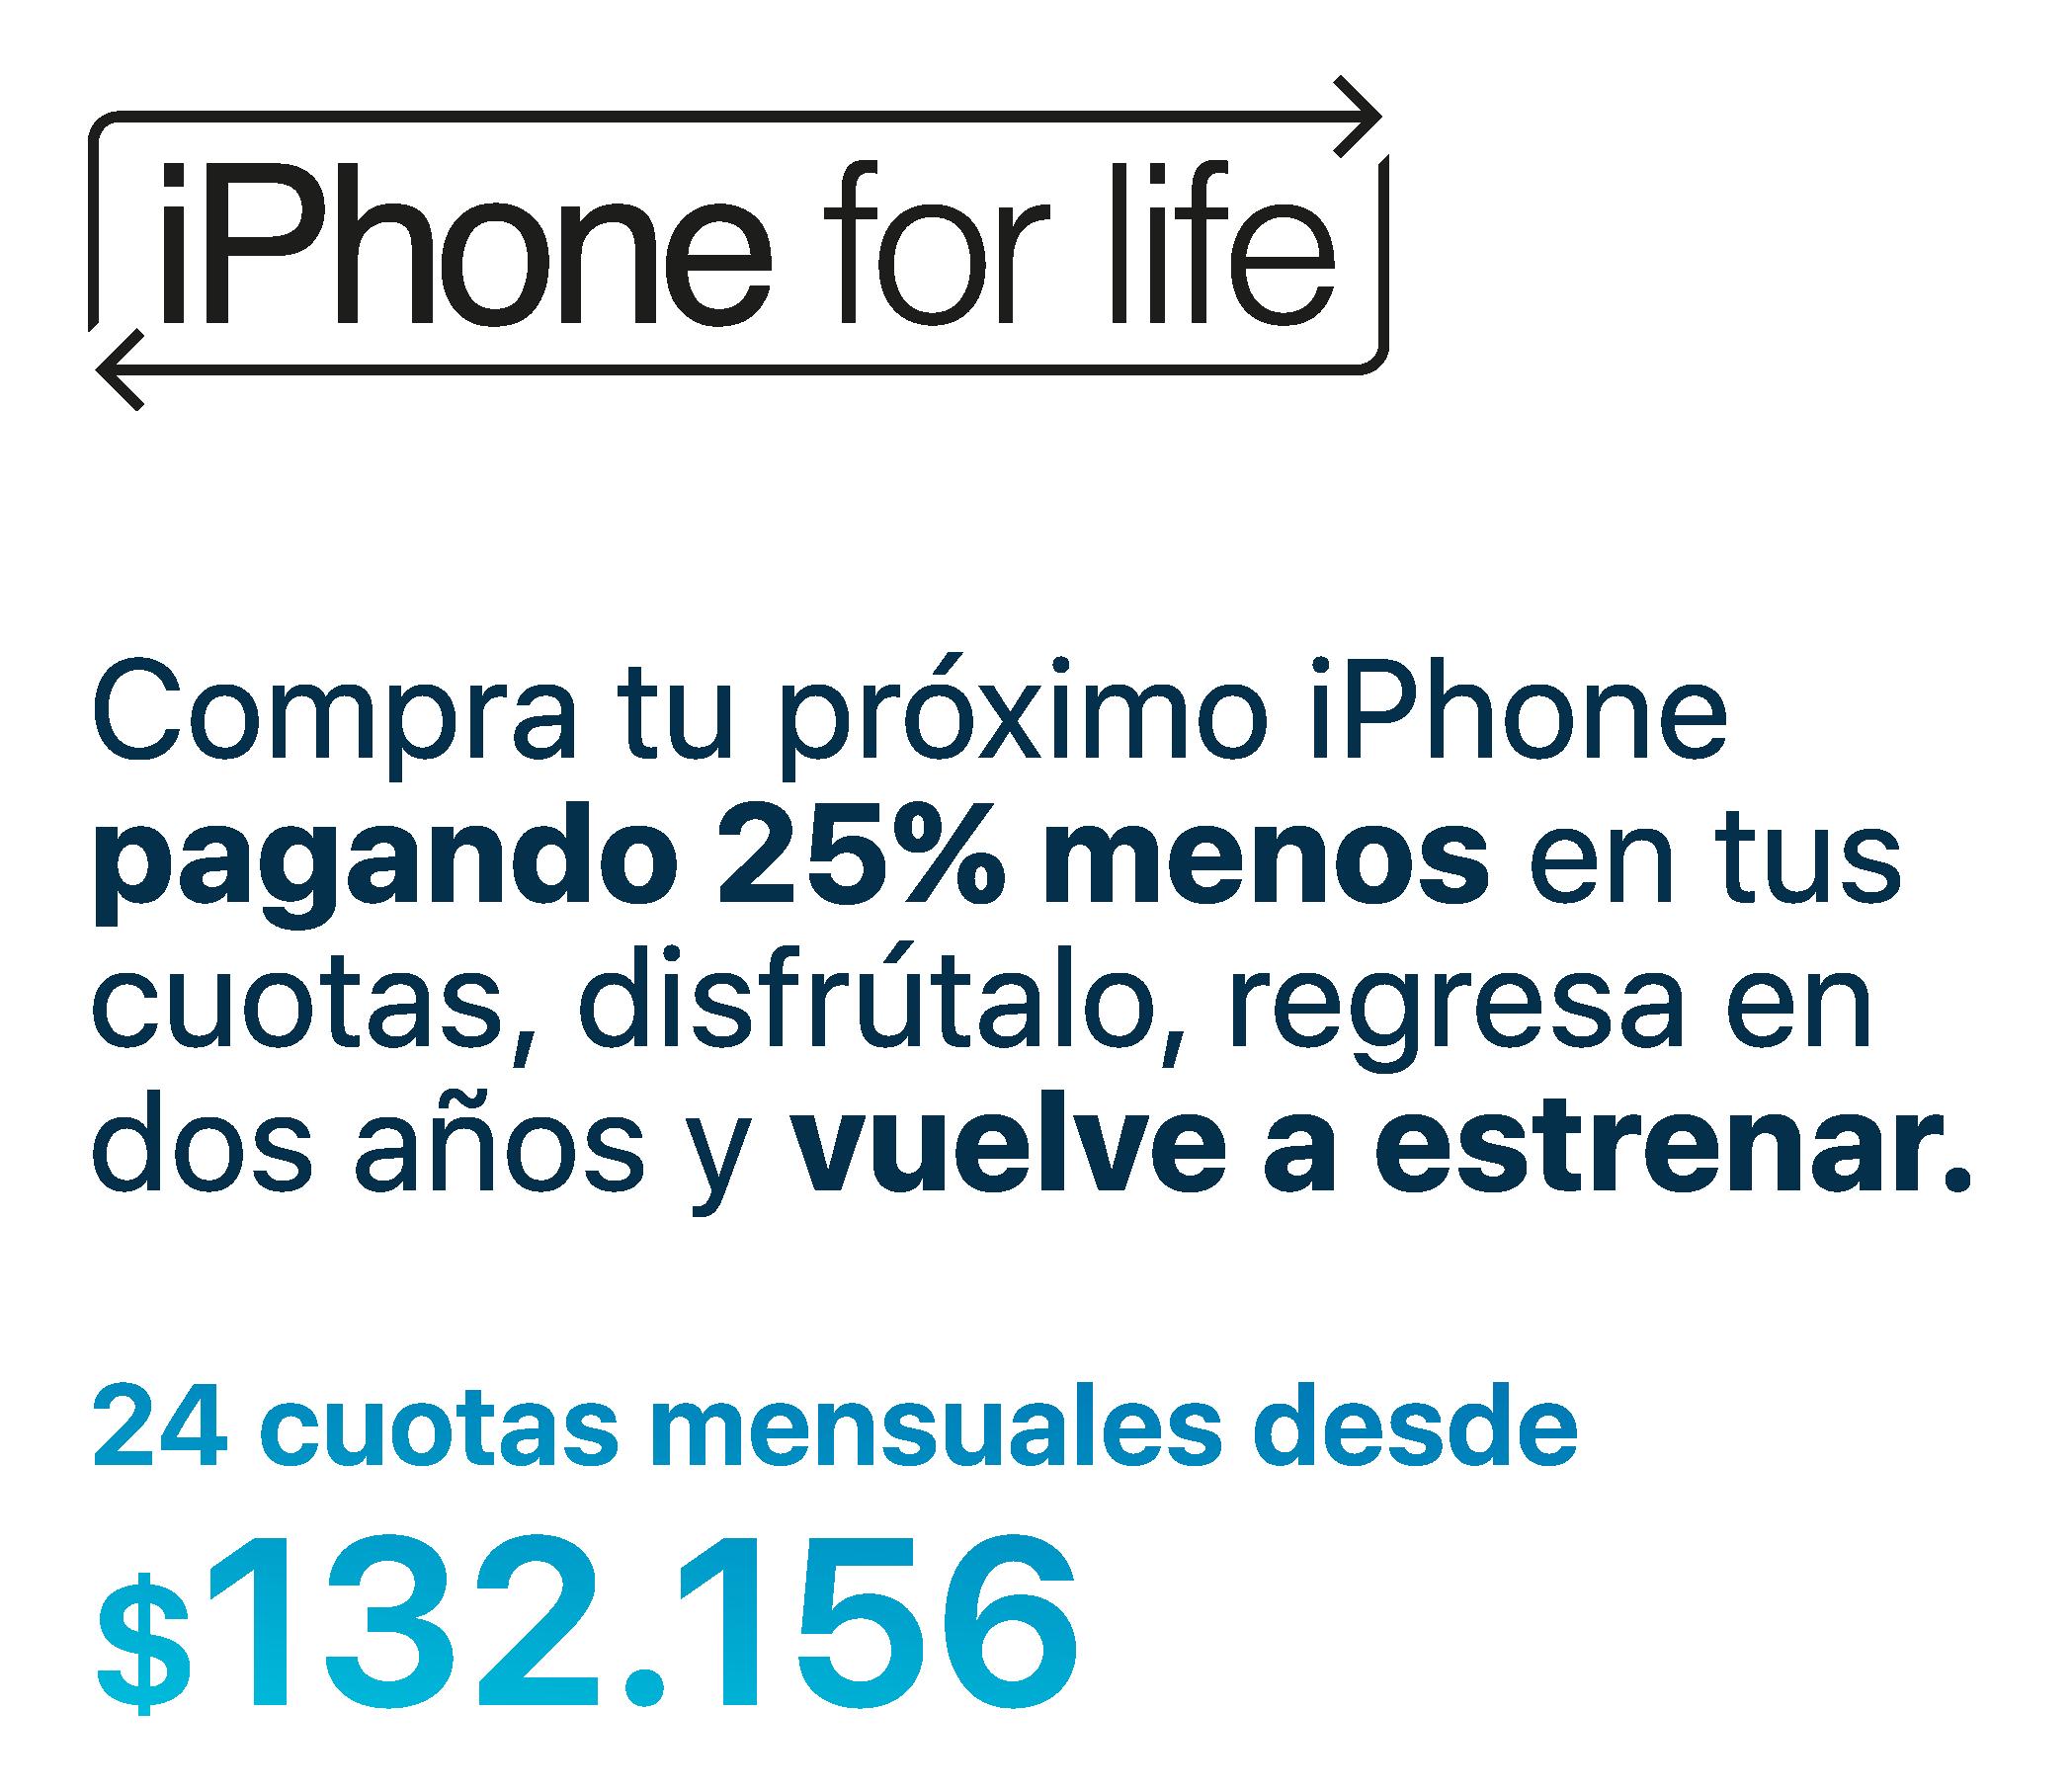 compra tu próximo iPhone